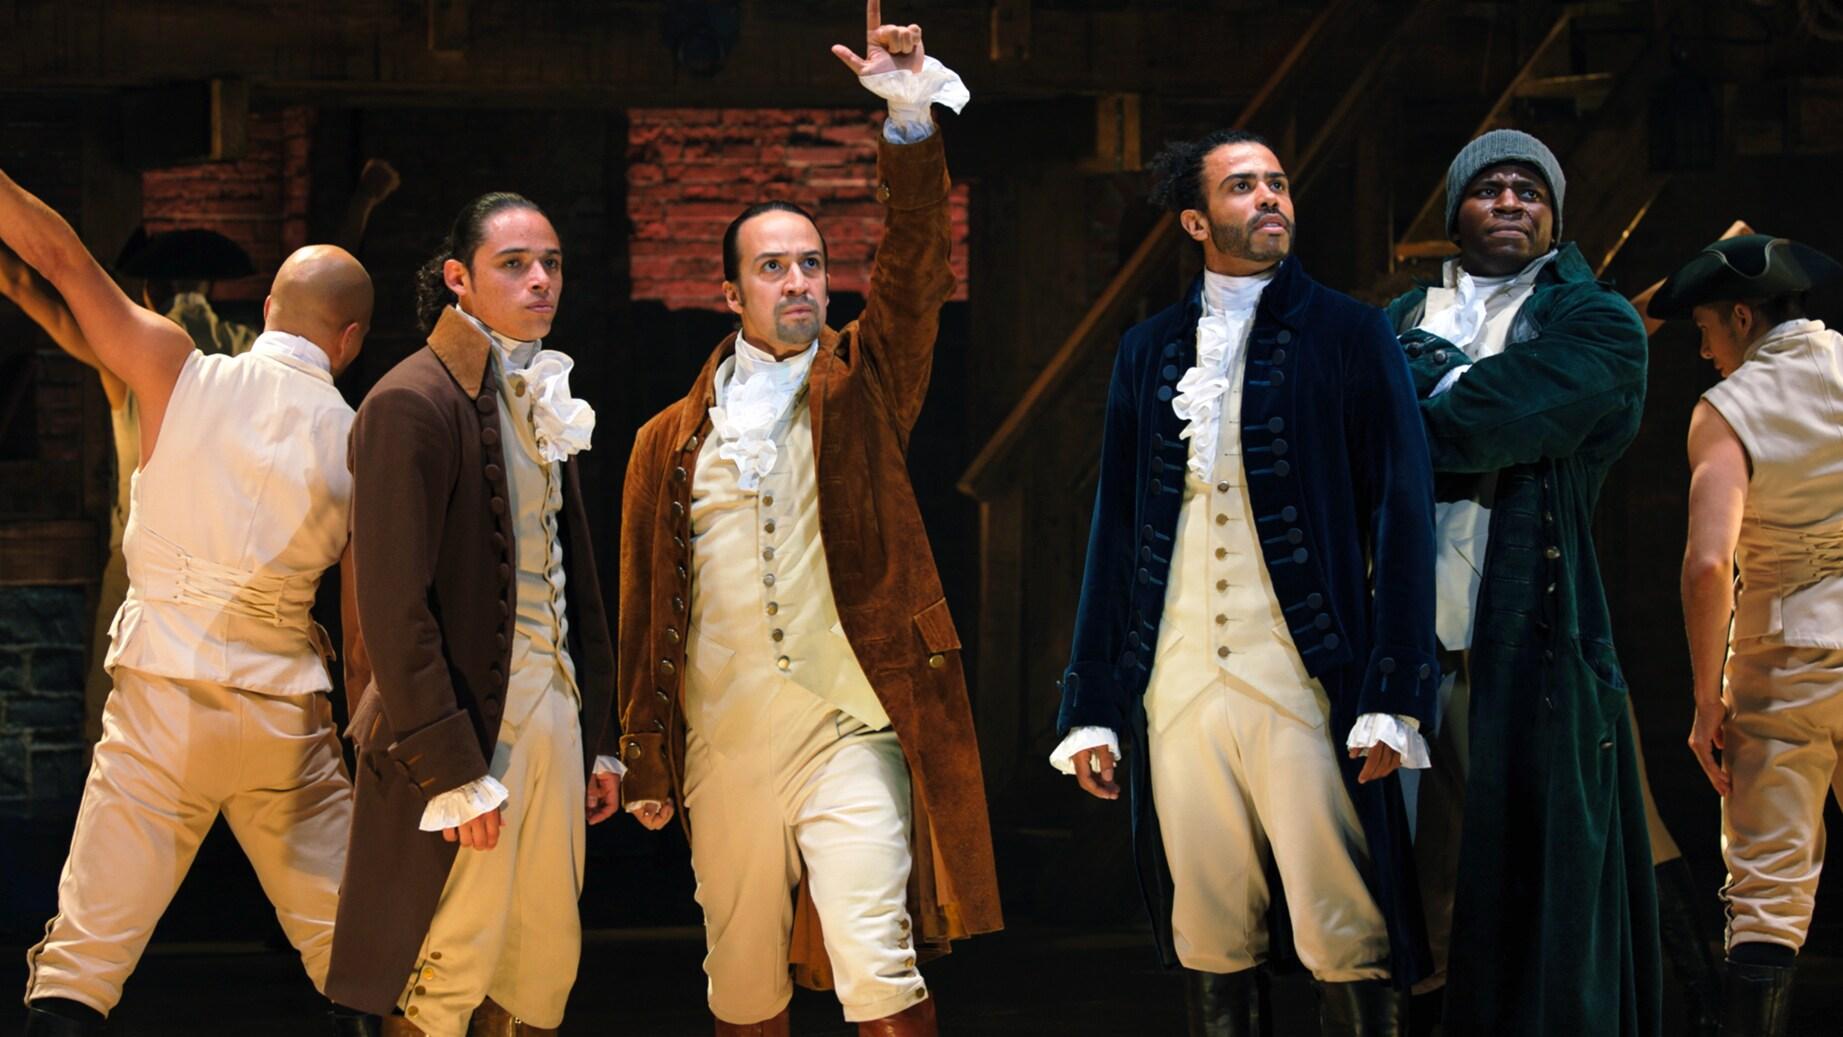 (L-R): Anthony Ramos is John Laurens, Lin-Manuel Miranda is Alexander Hamilton, Daveed Diggs is the Marquis de Lafayette, and Okieriete Onaodowan is Hercules Mulligan in HAMILTON, the filmed version of the original Broadway production.